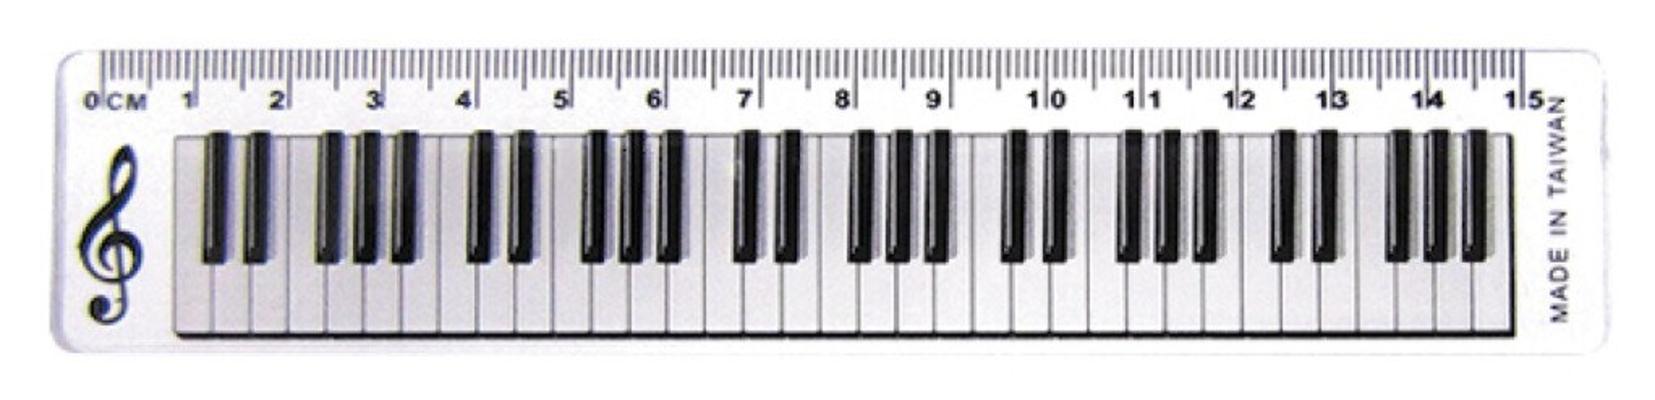 Cadeau 15cm Regle Ruler Keyboard Design Clear     Fournitures